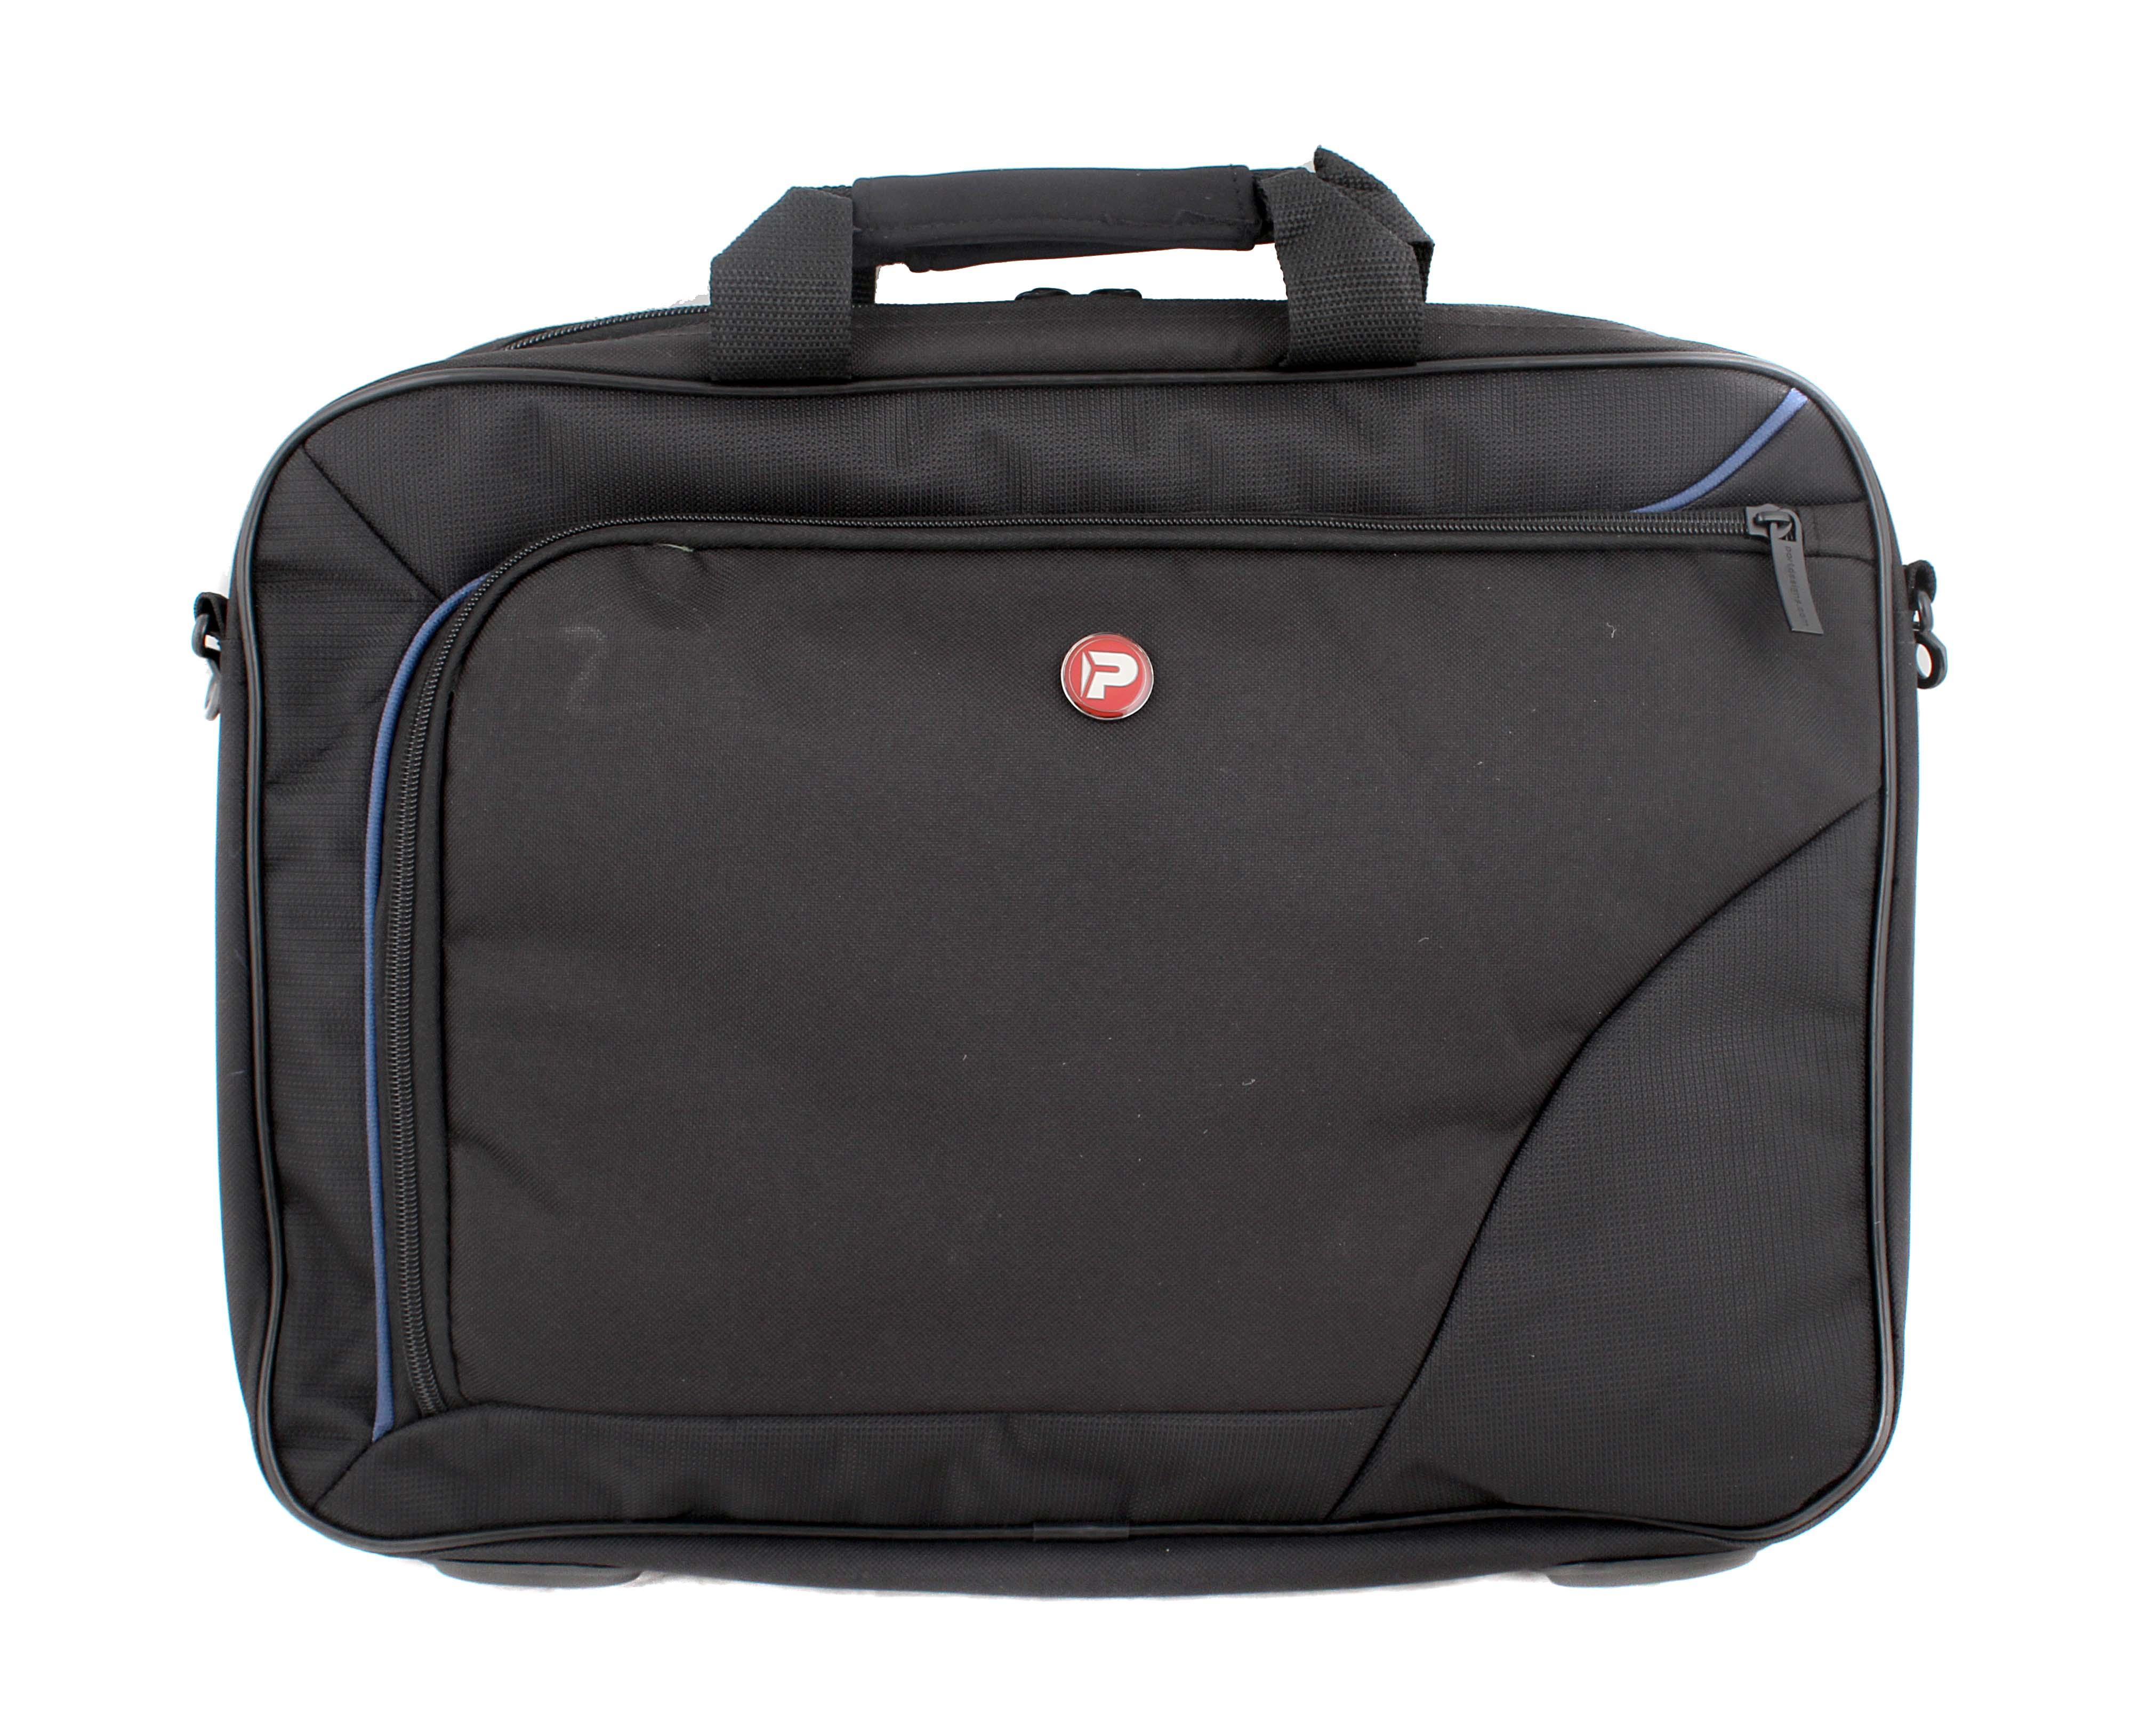 Кейс для ноутбука Portdesigns Real Brand Technics 1377.000